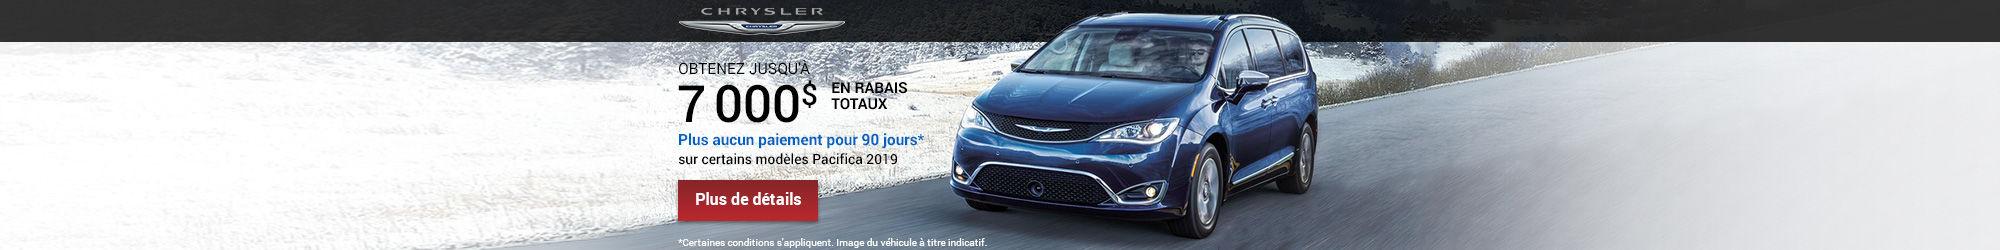 L'événement Chrysler